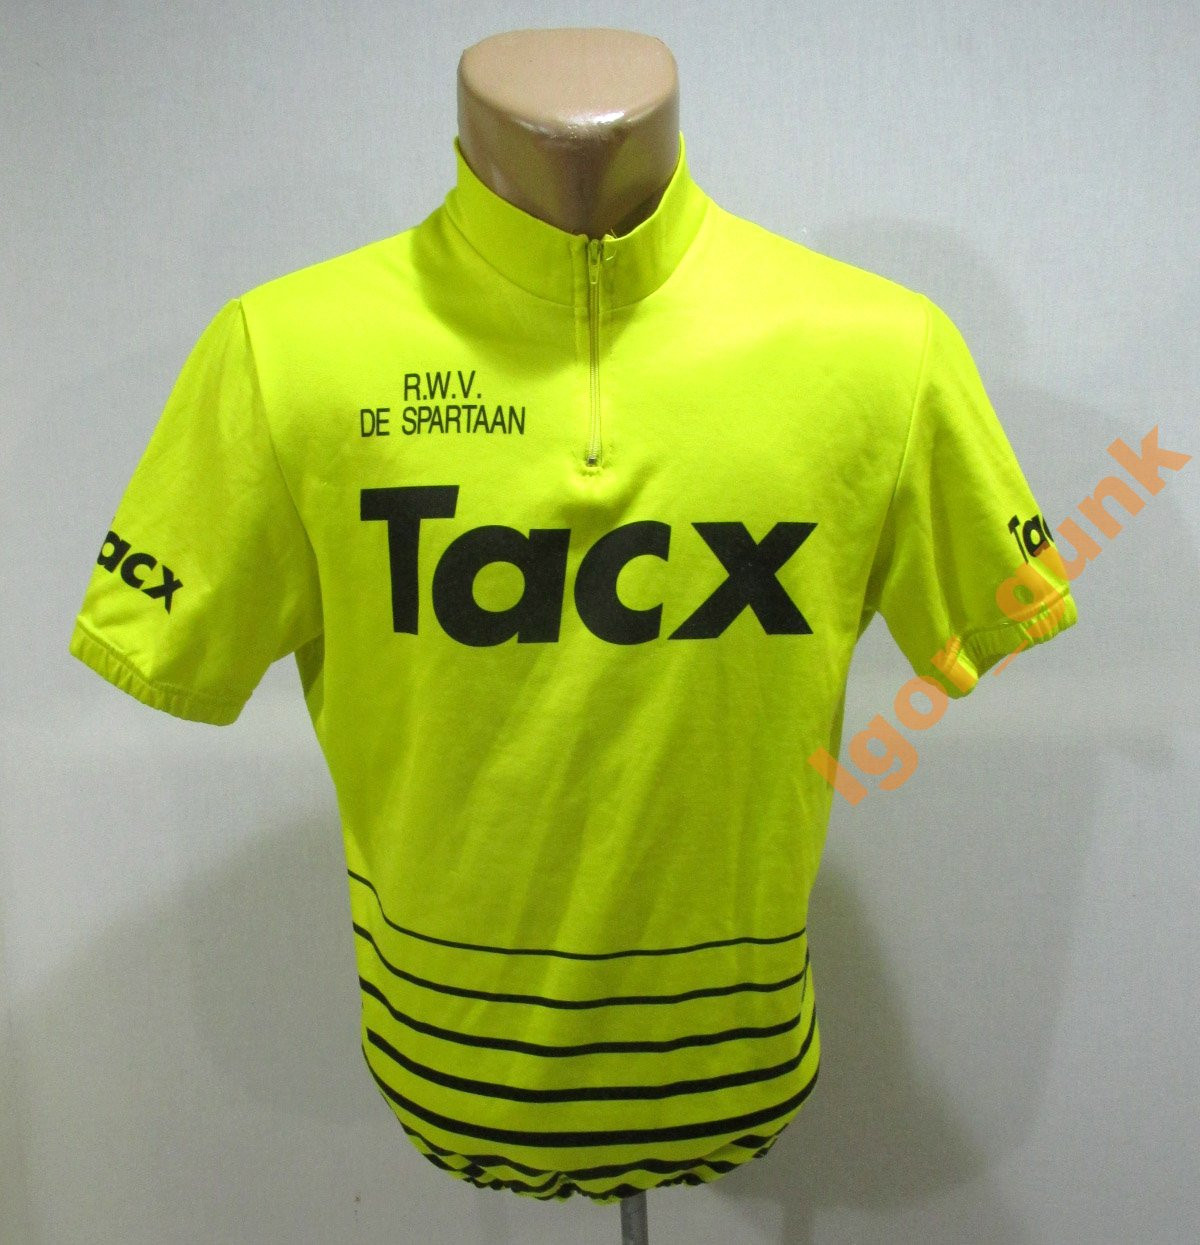 Вело футболка TACX, M, СКИДКА, Уценка!